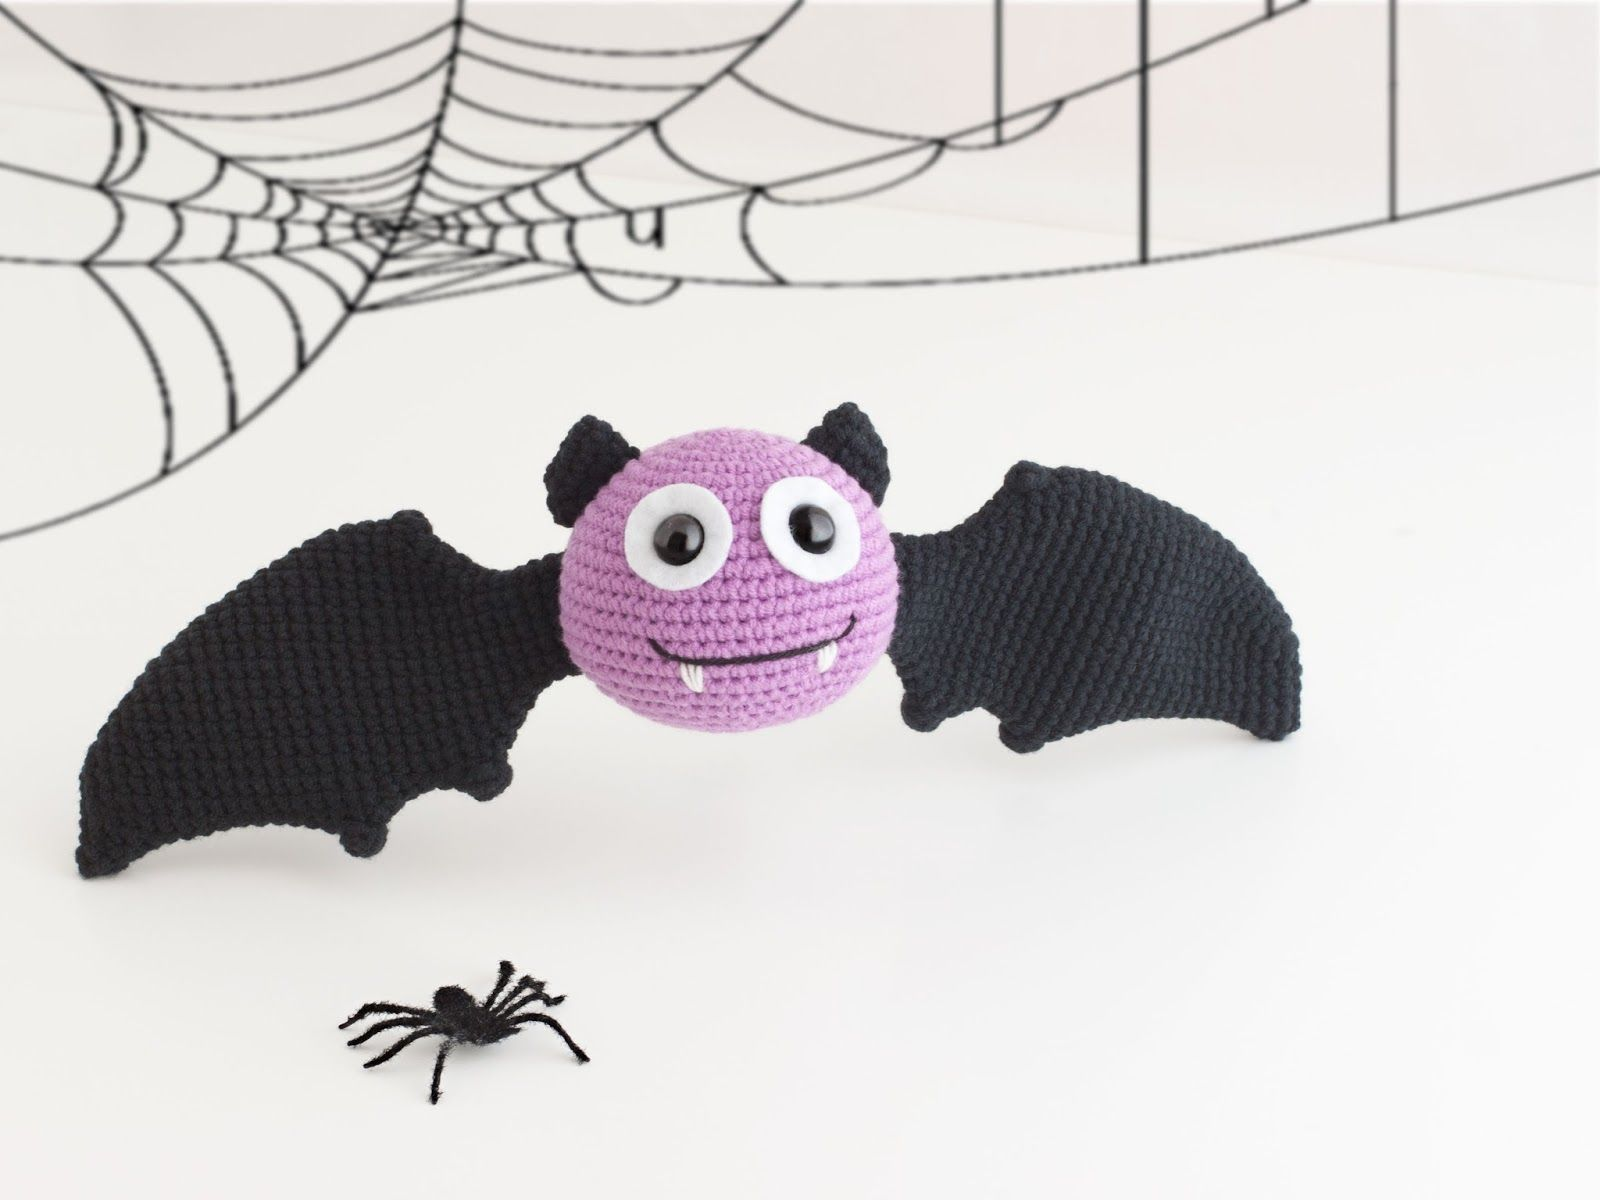 Amigurumi Bat - FREE Crochet Pattern / Tutorial in English here ...